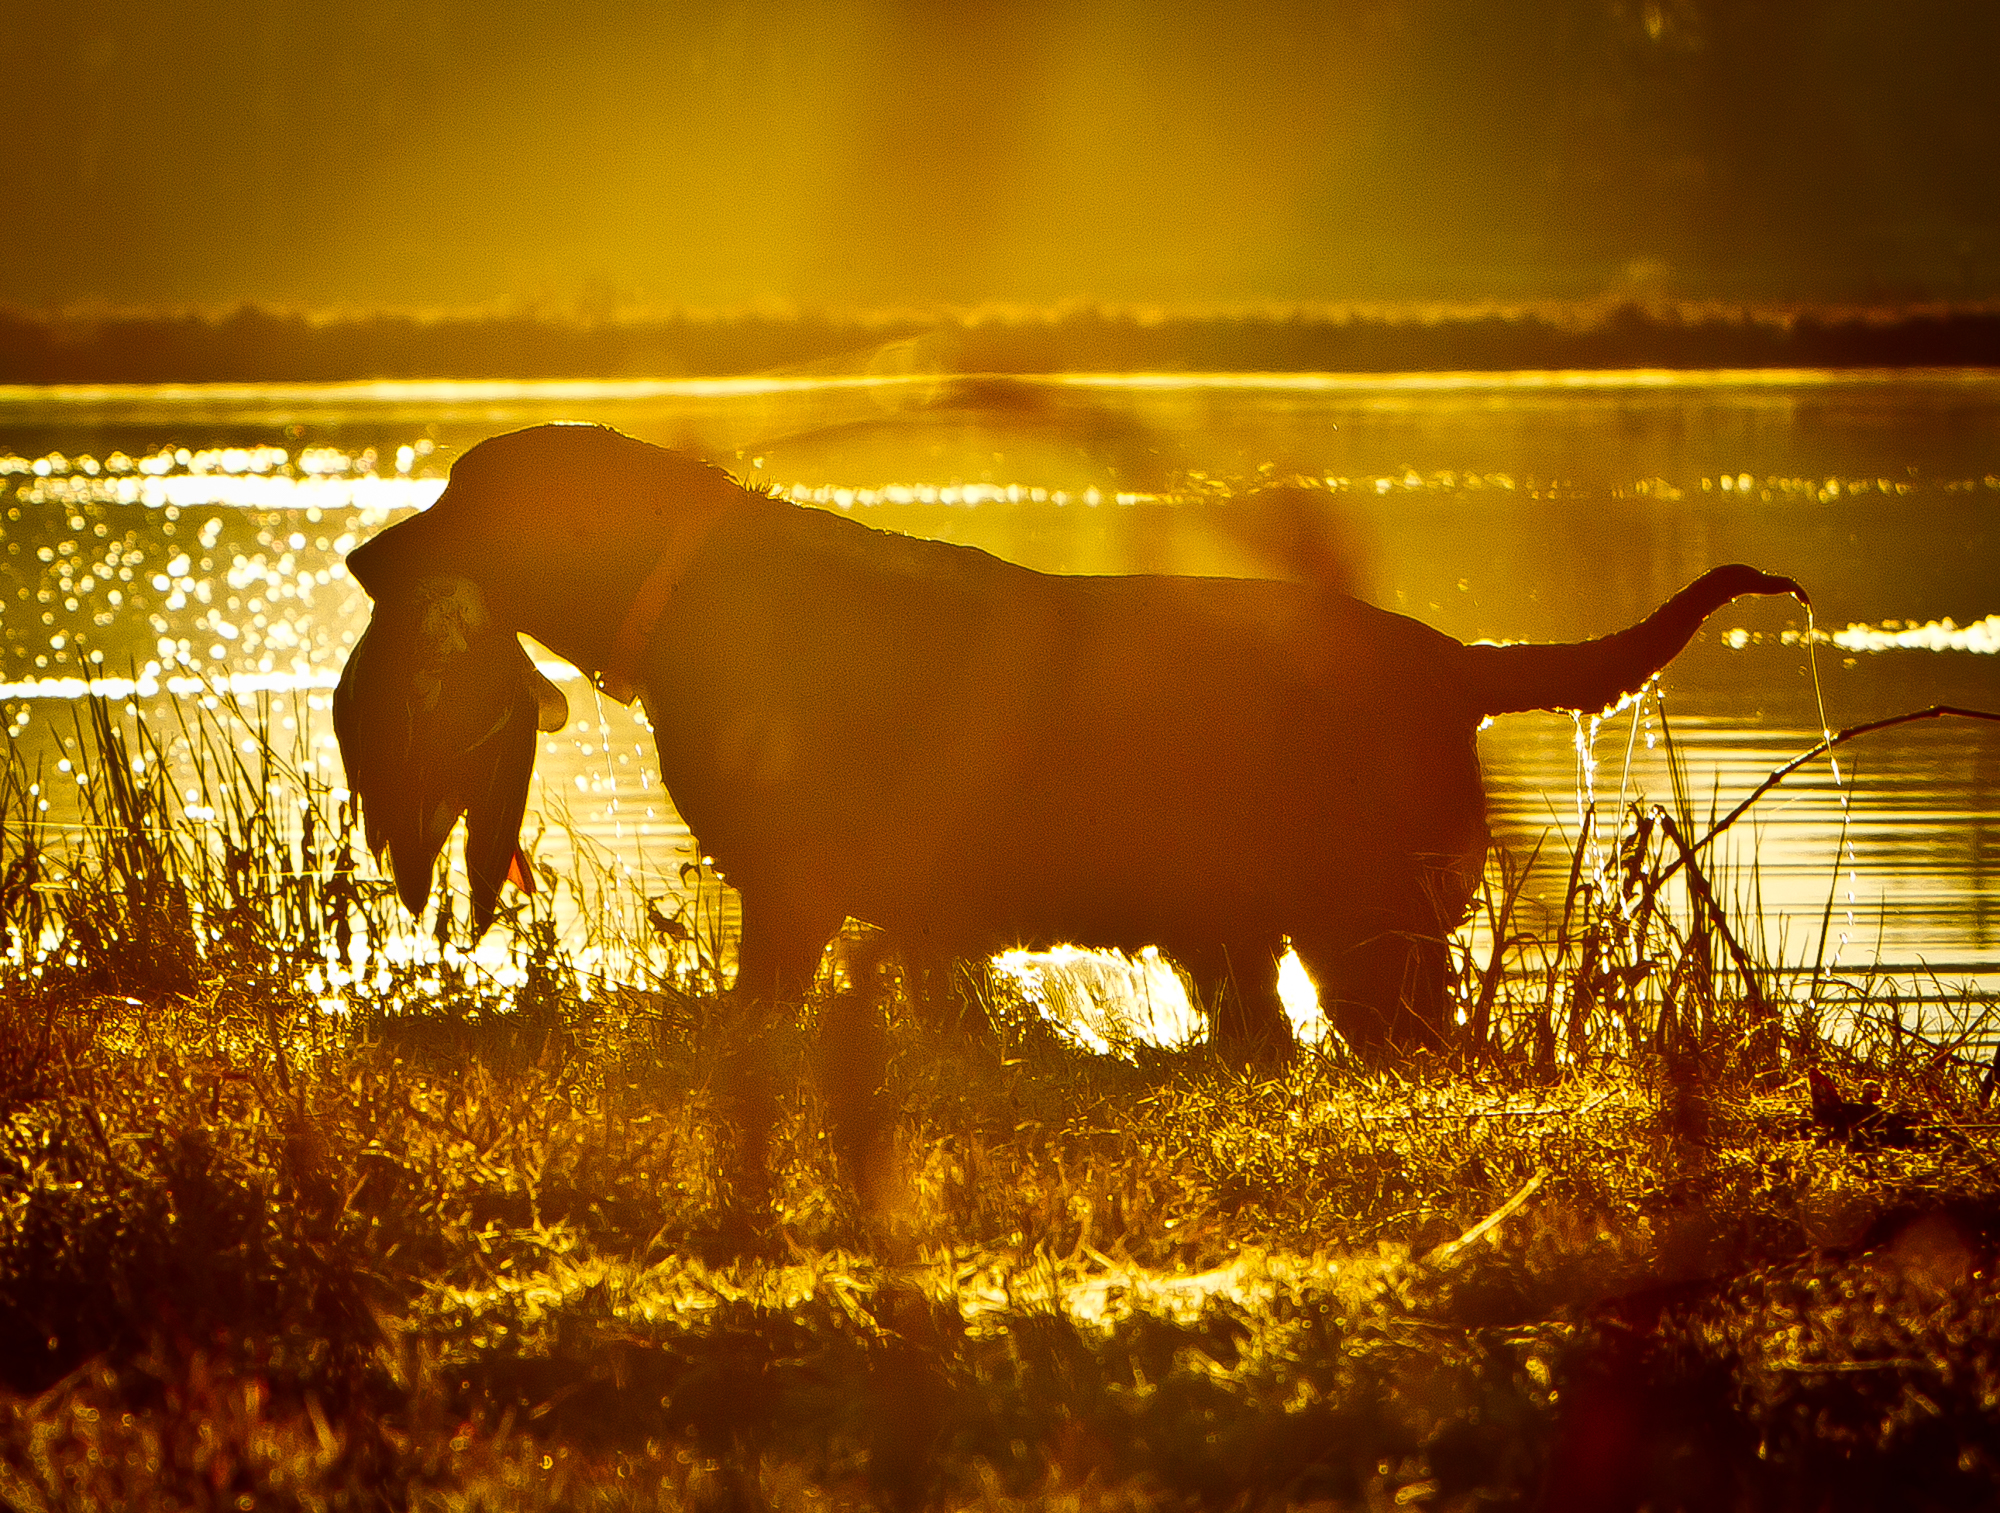 rick-meoli-commercial-photographer-outdoor-animal-lifestyle-repheads-82